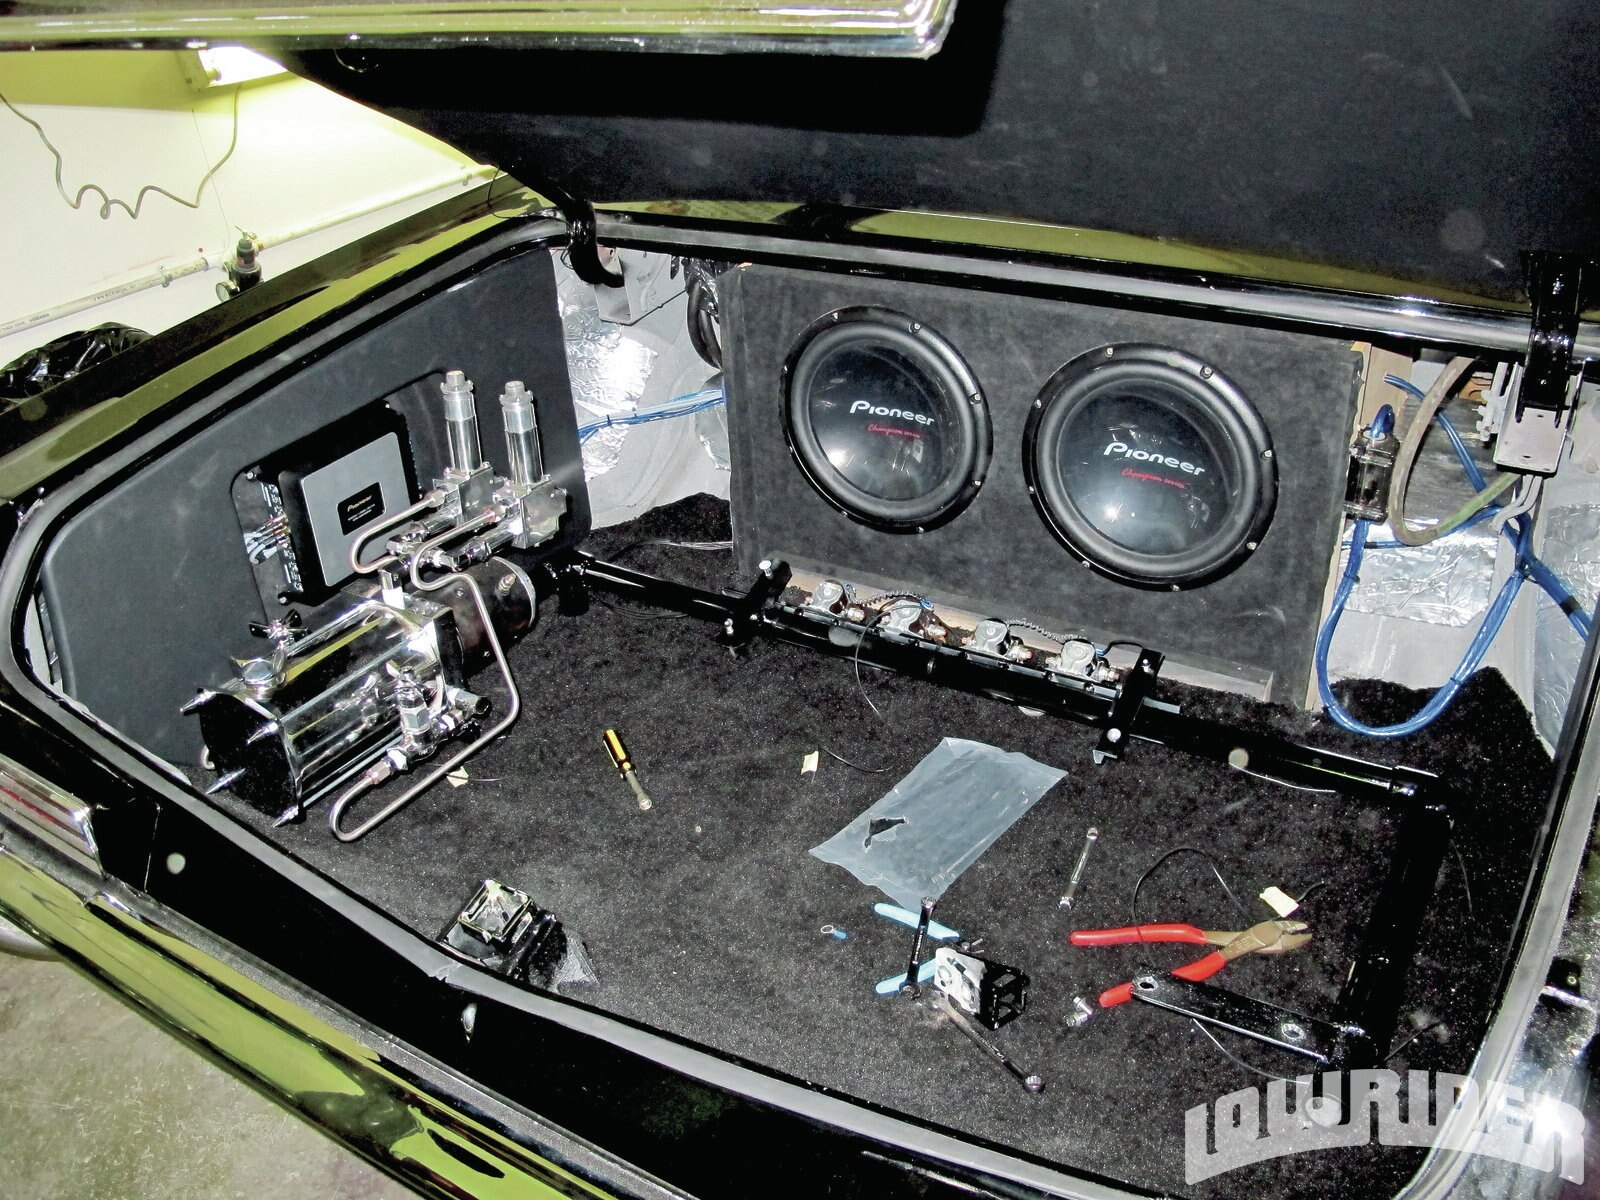 toyota rav4 radio wiring diagram images toyota rav4 dvd player cr v vs toyota rav4 besides battery isolator switch wiring diagram